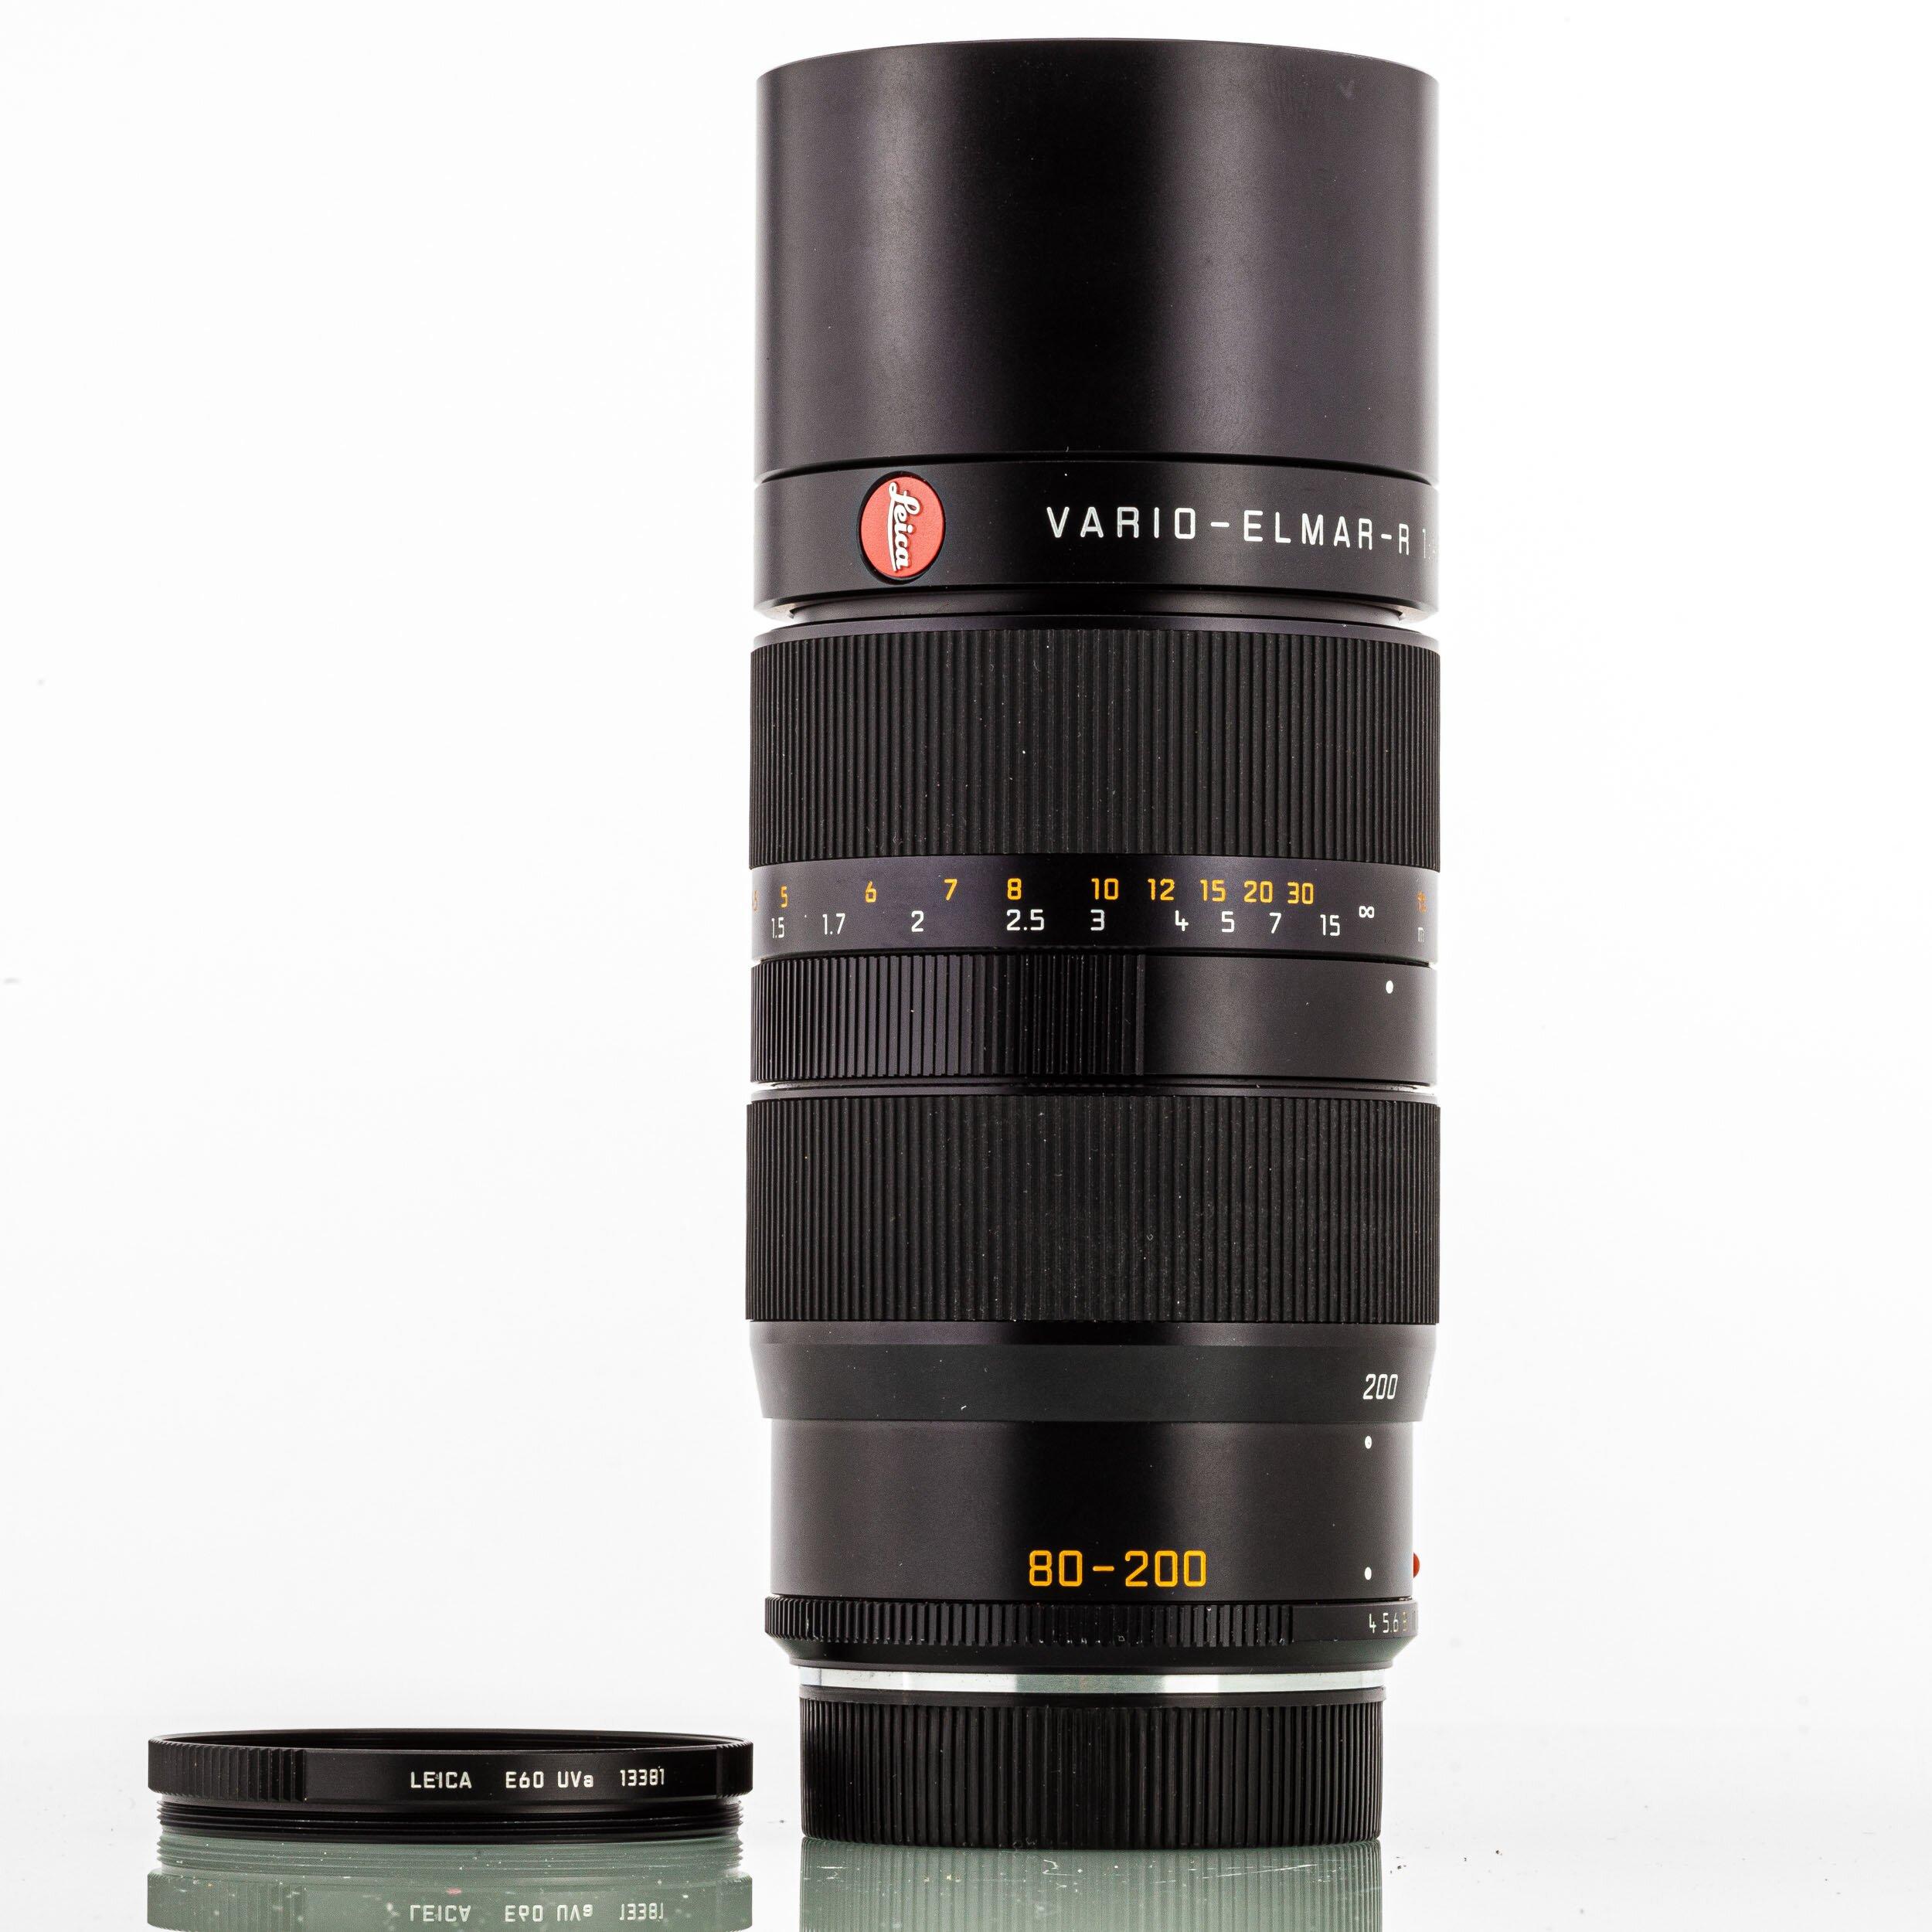 Leica Vario-Elmar-R 1:4/80-200mm ROM E60